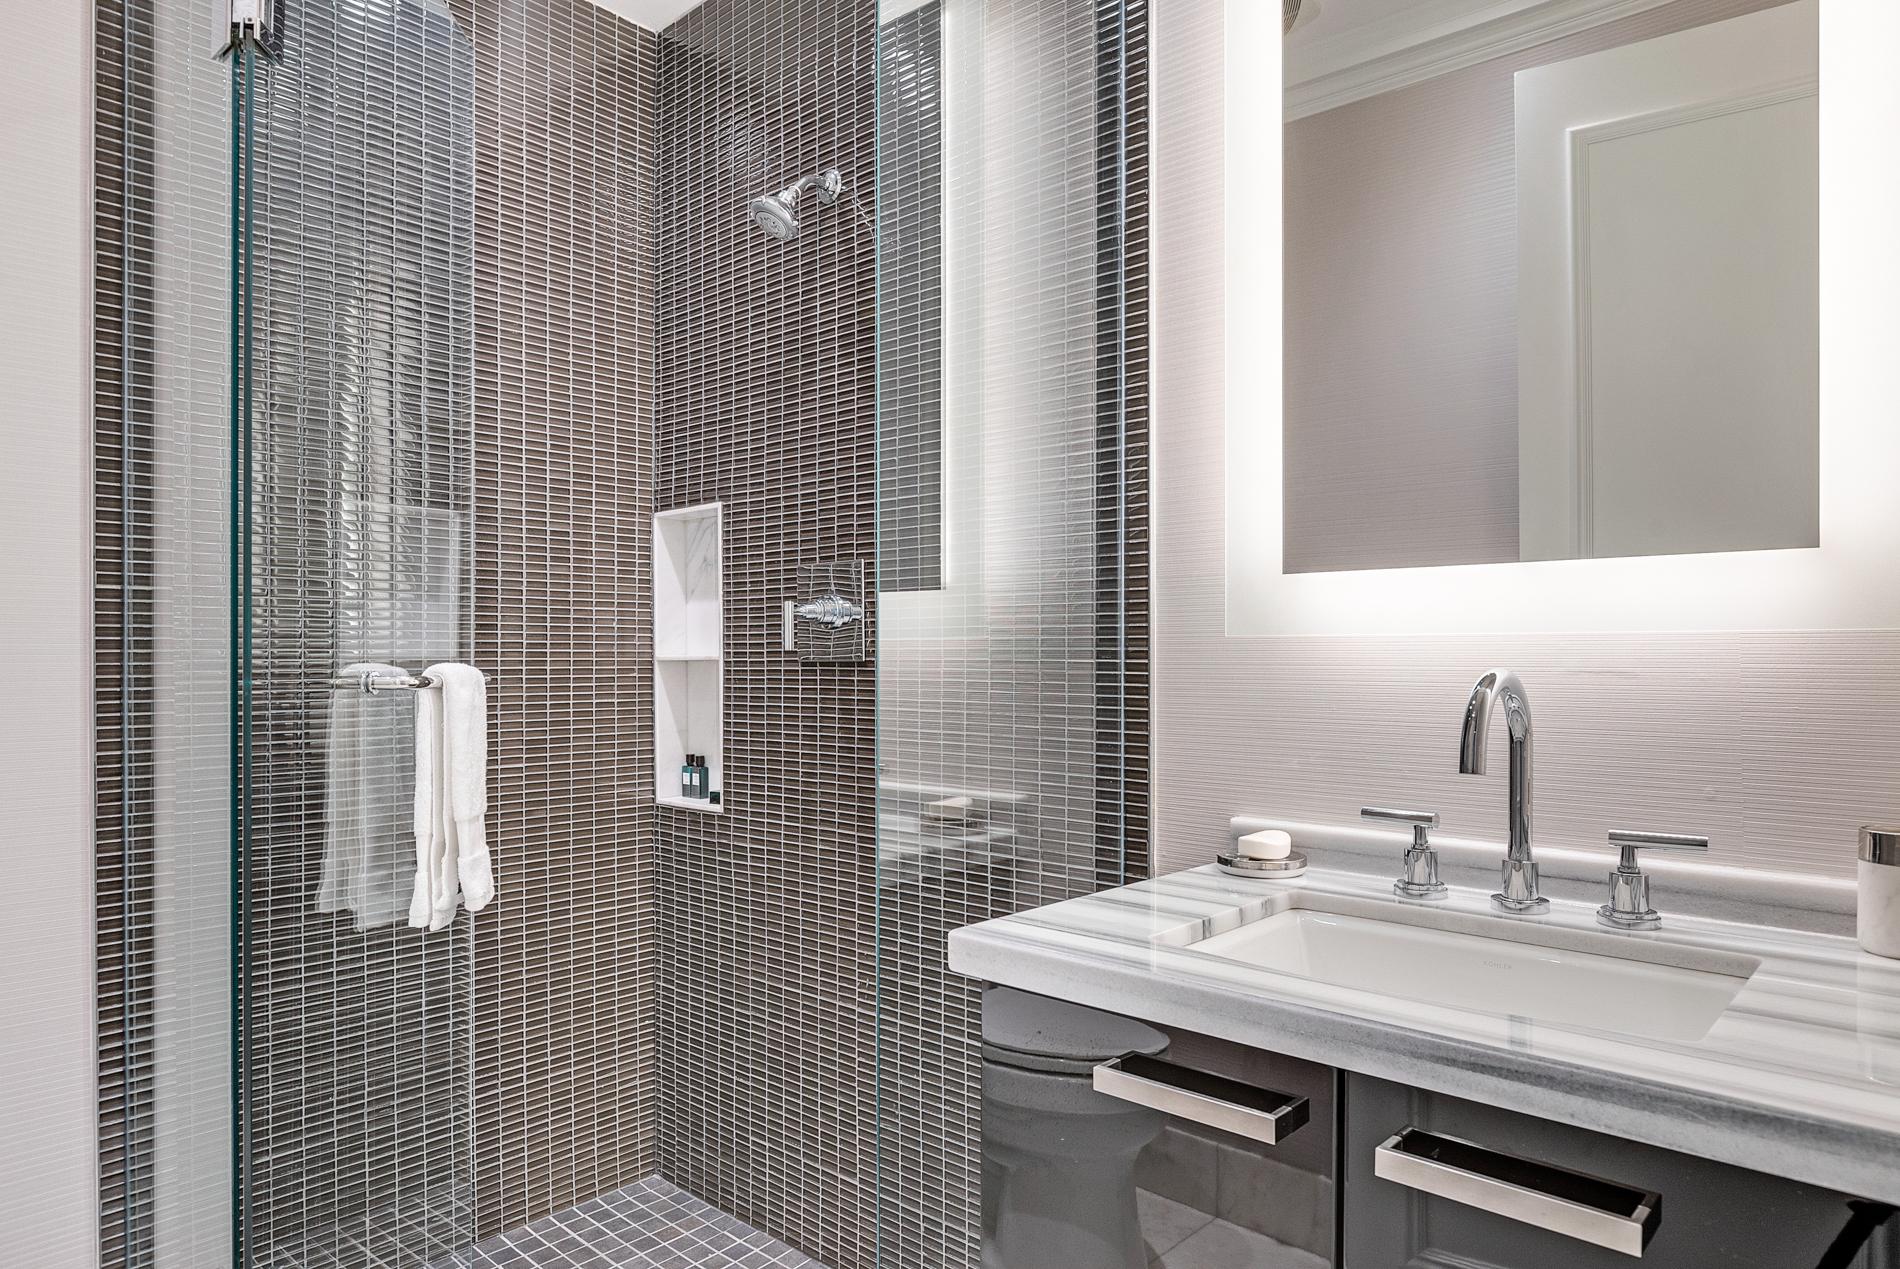 DSC02925silverhouse-real-estate-photogra